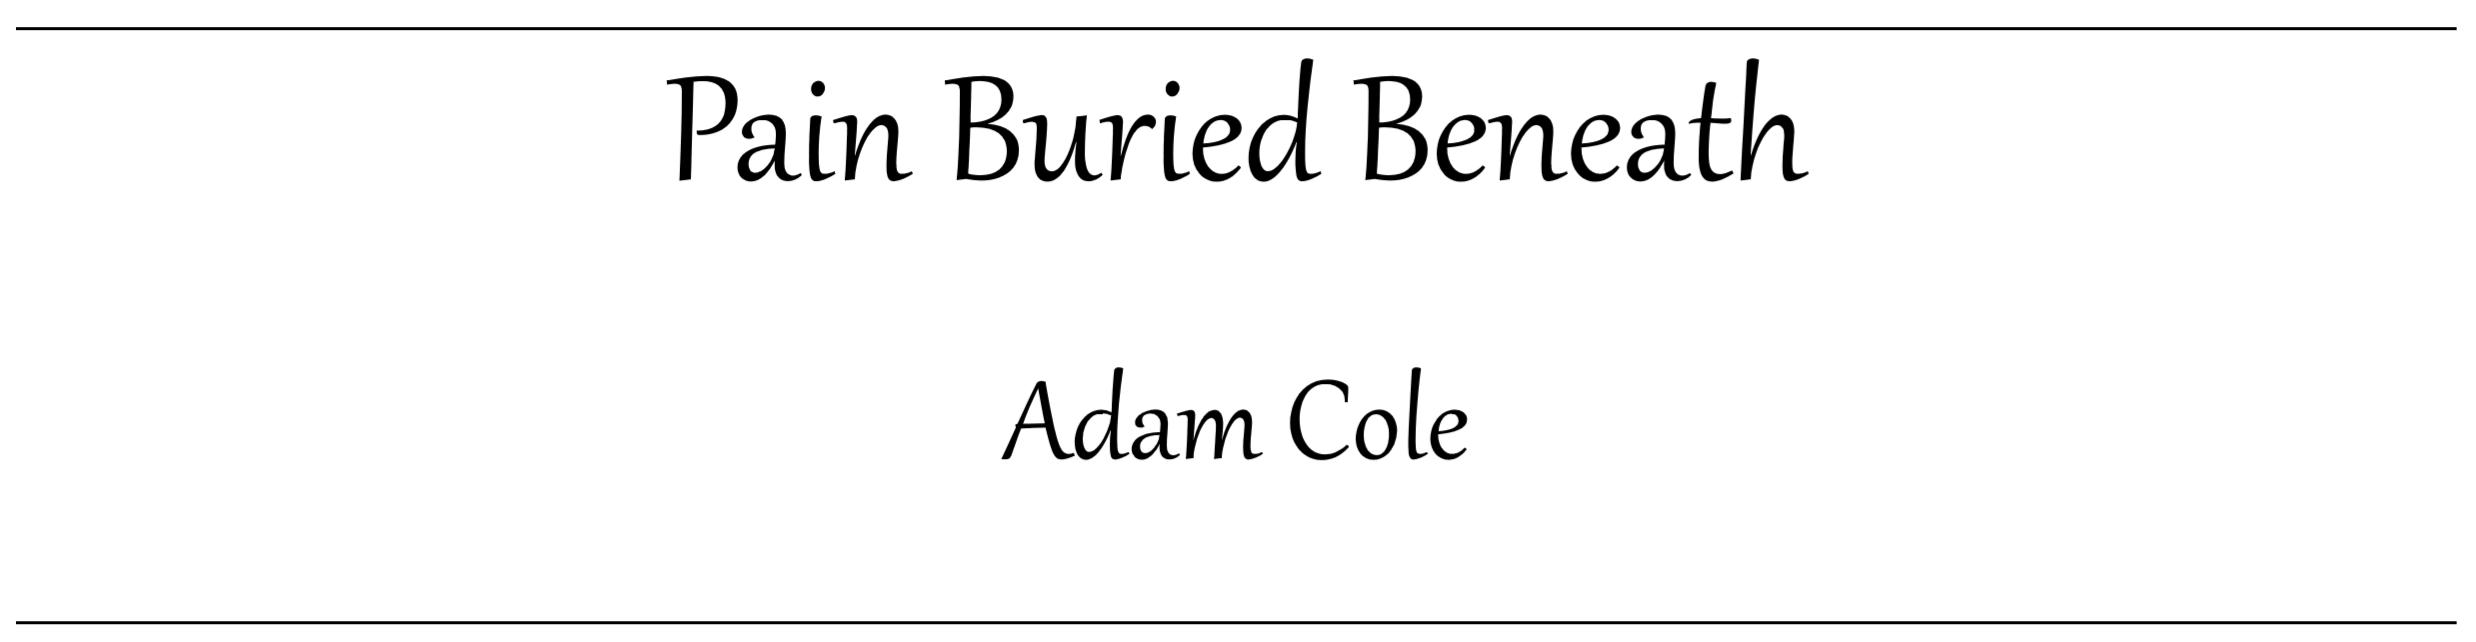 Pain Buried Beneath